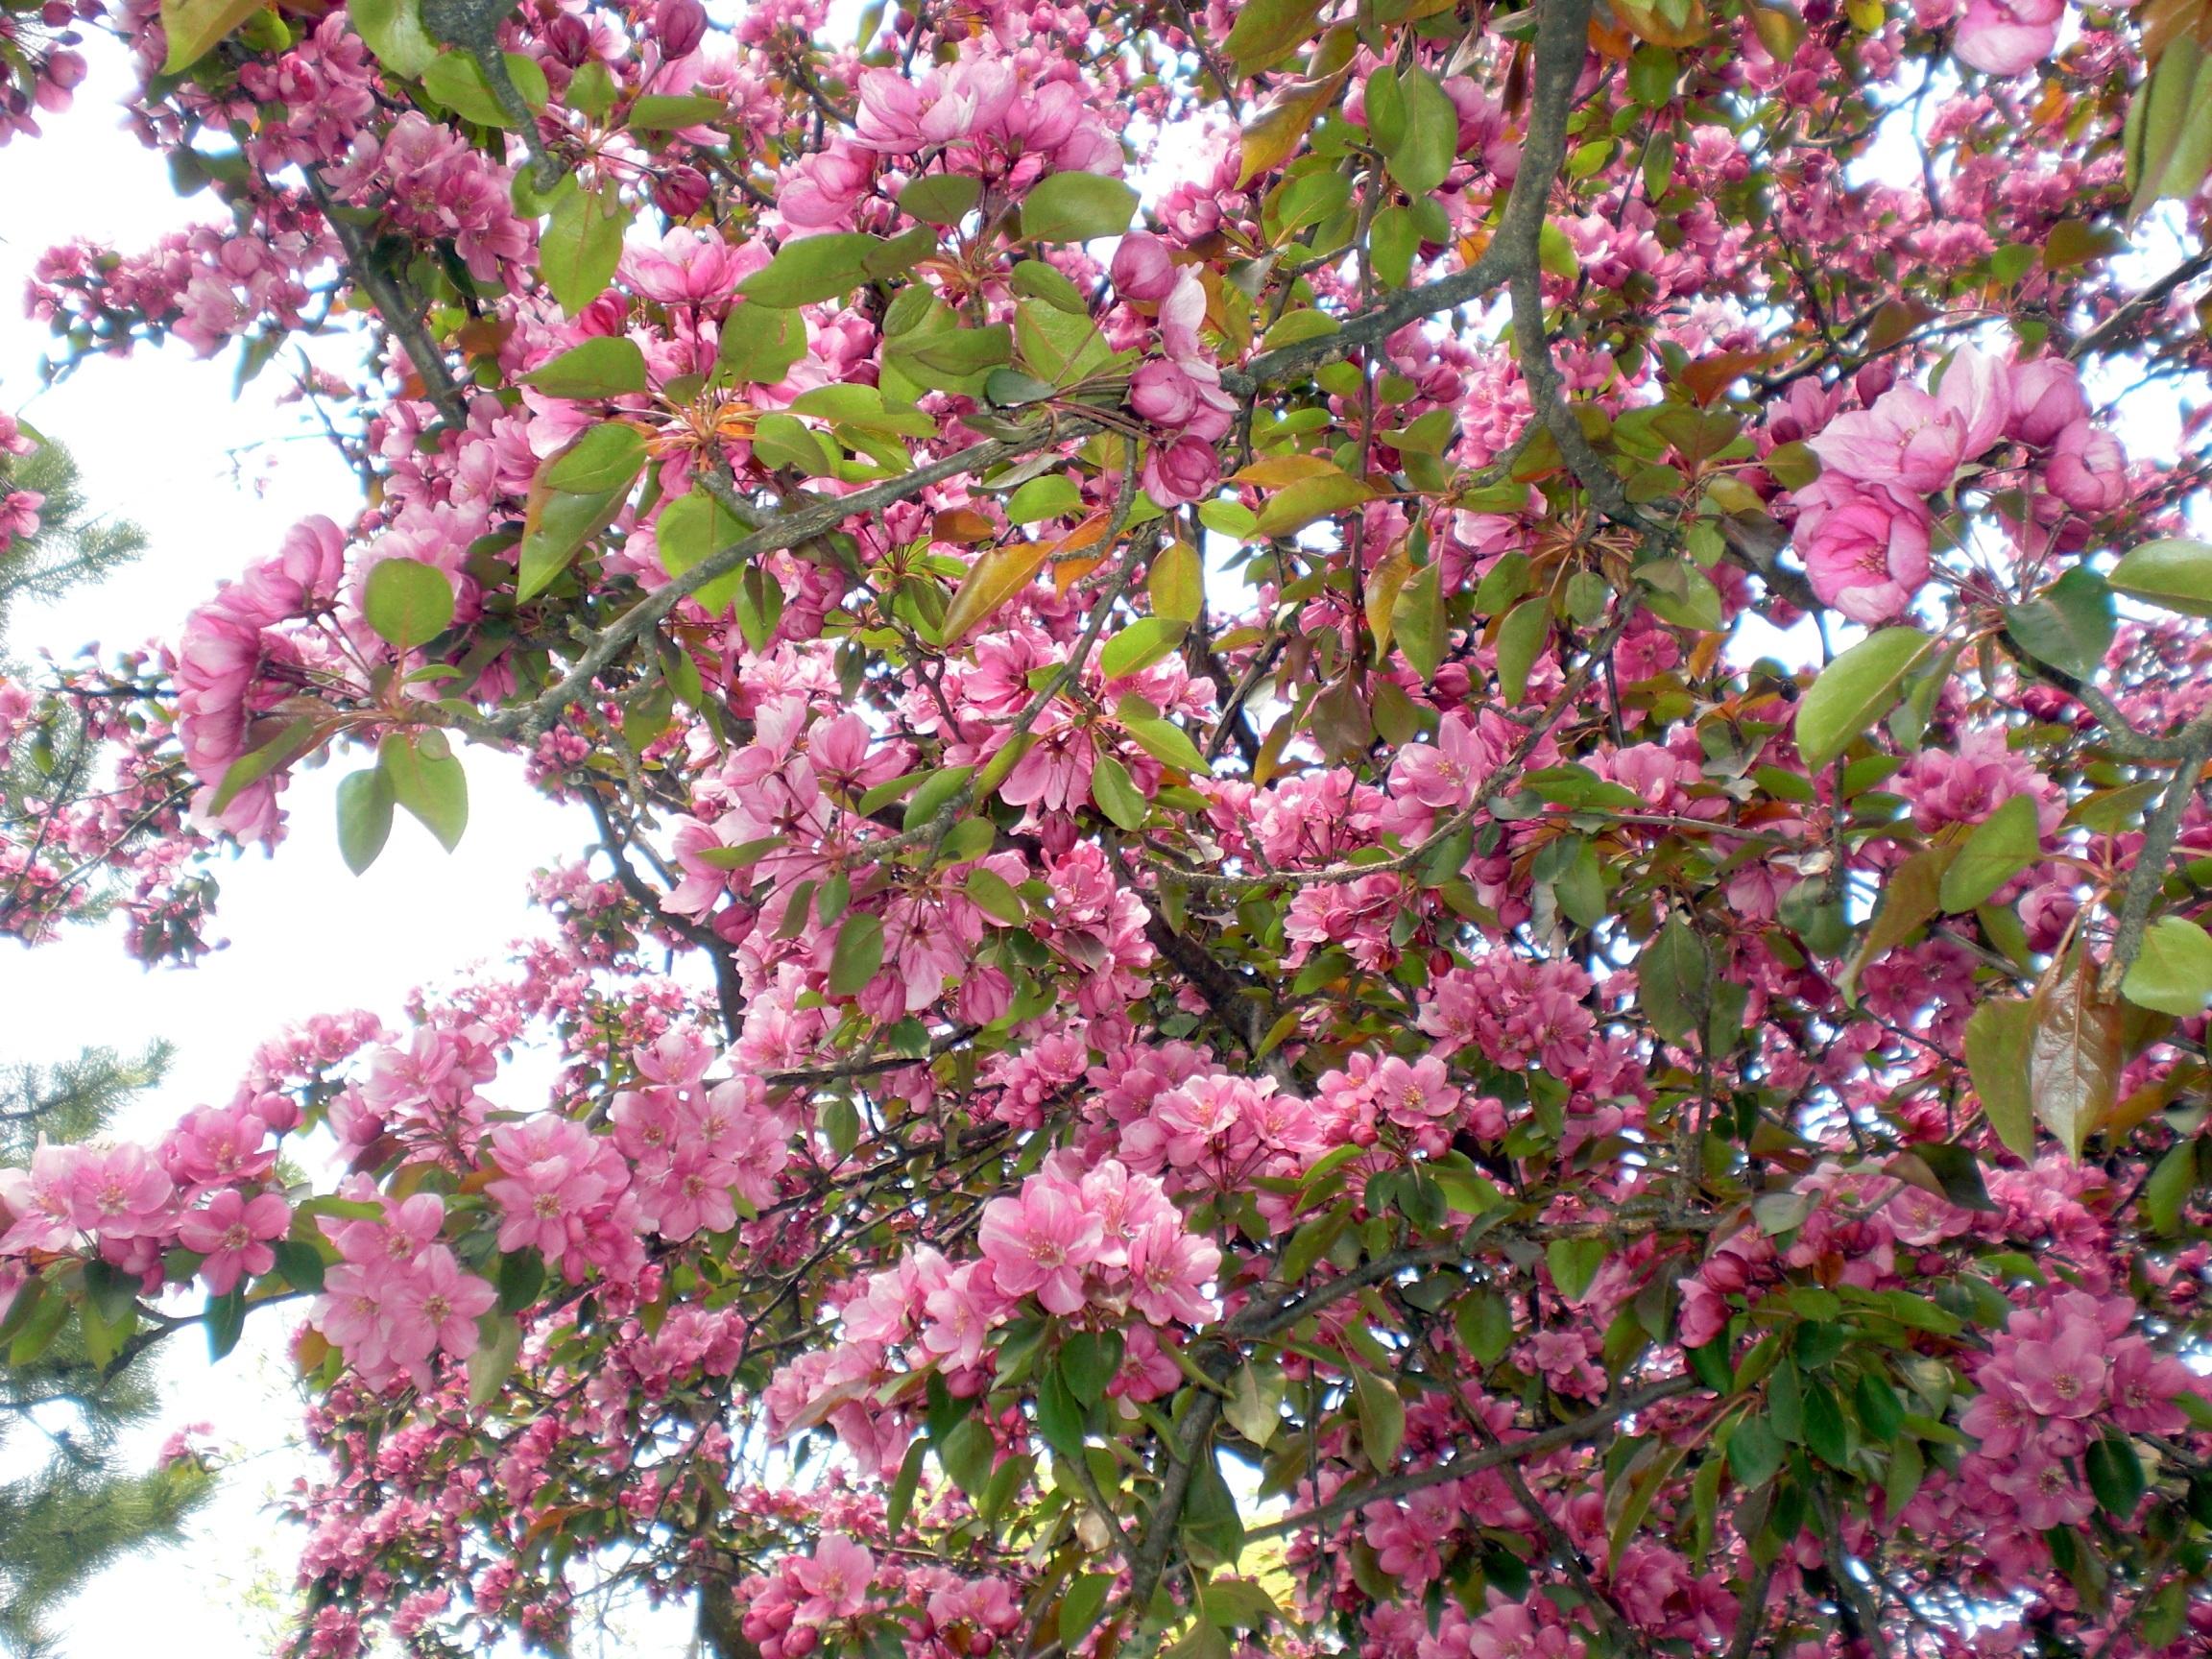 Fotos gratis paisaje rbol rama flor follaje - Arbol de rosas ...